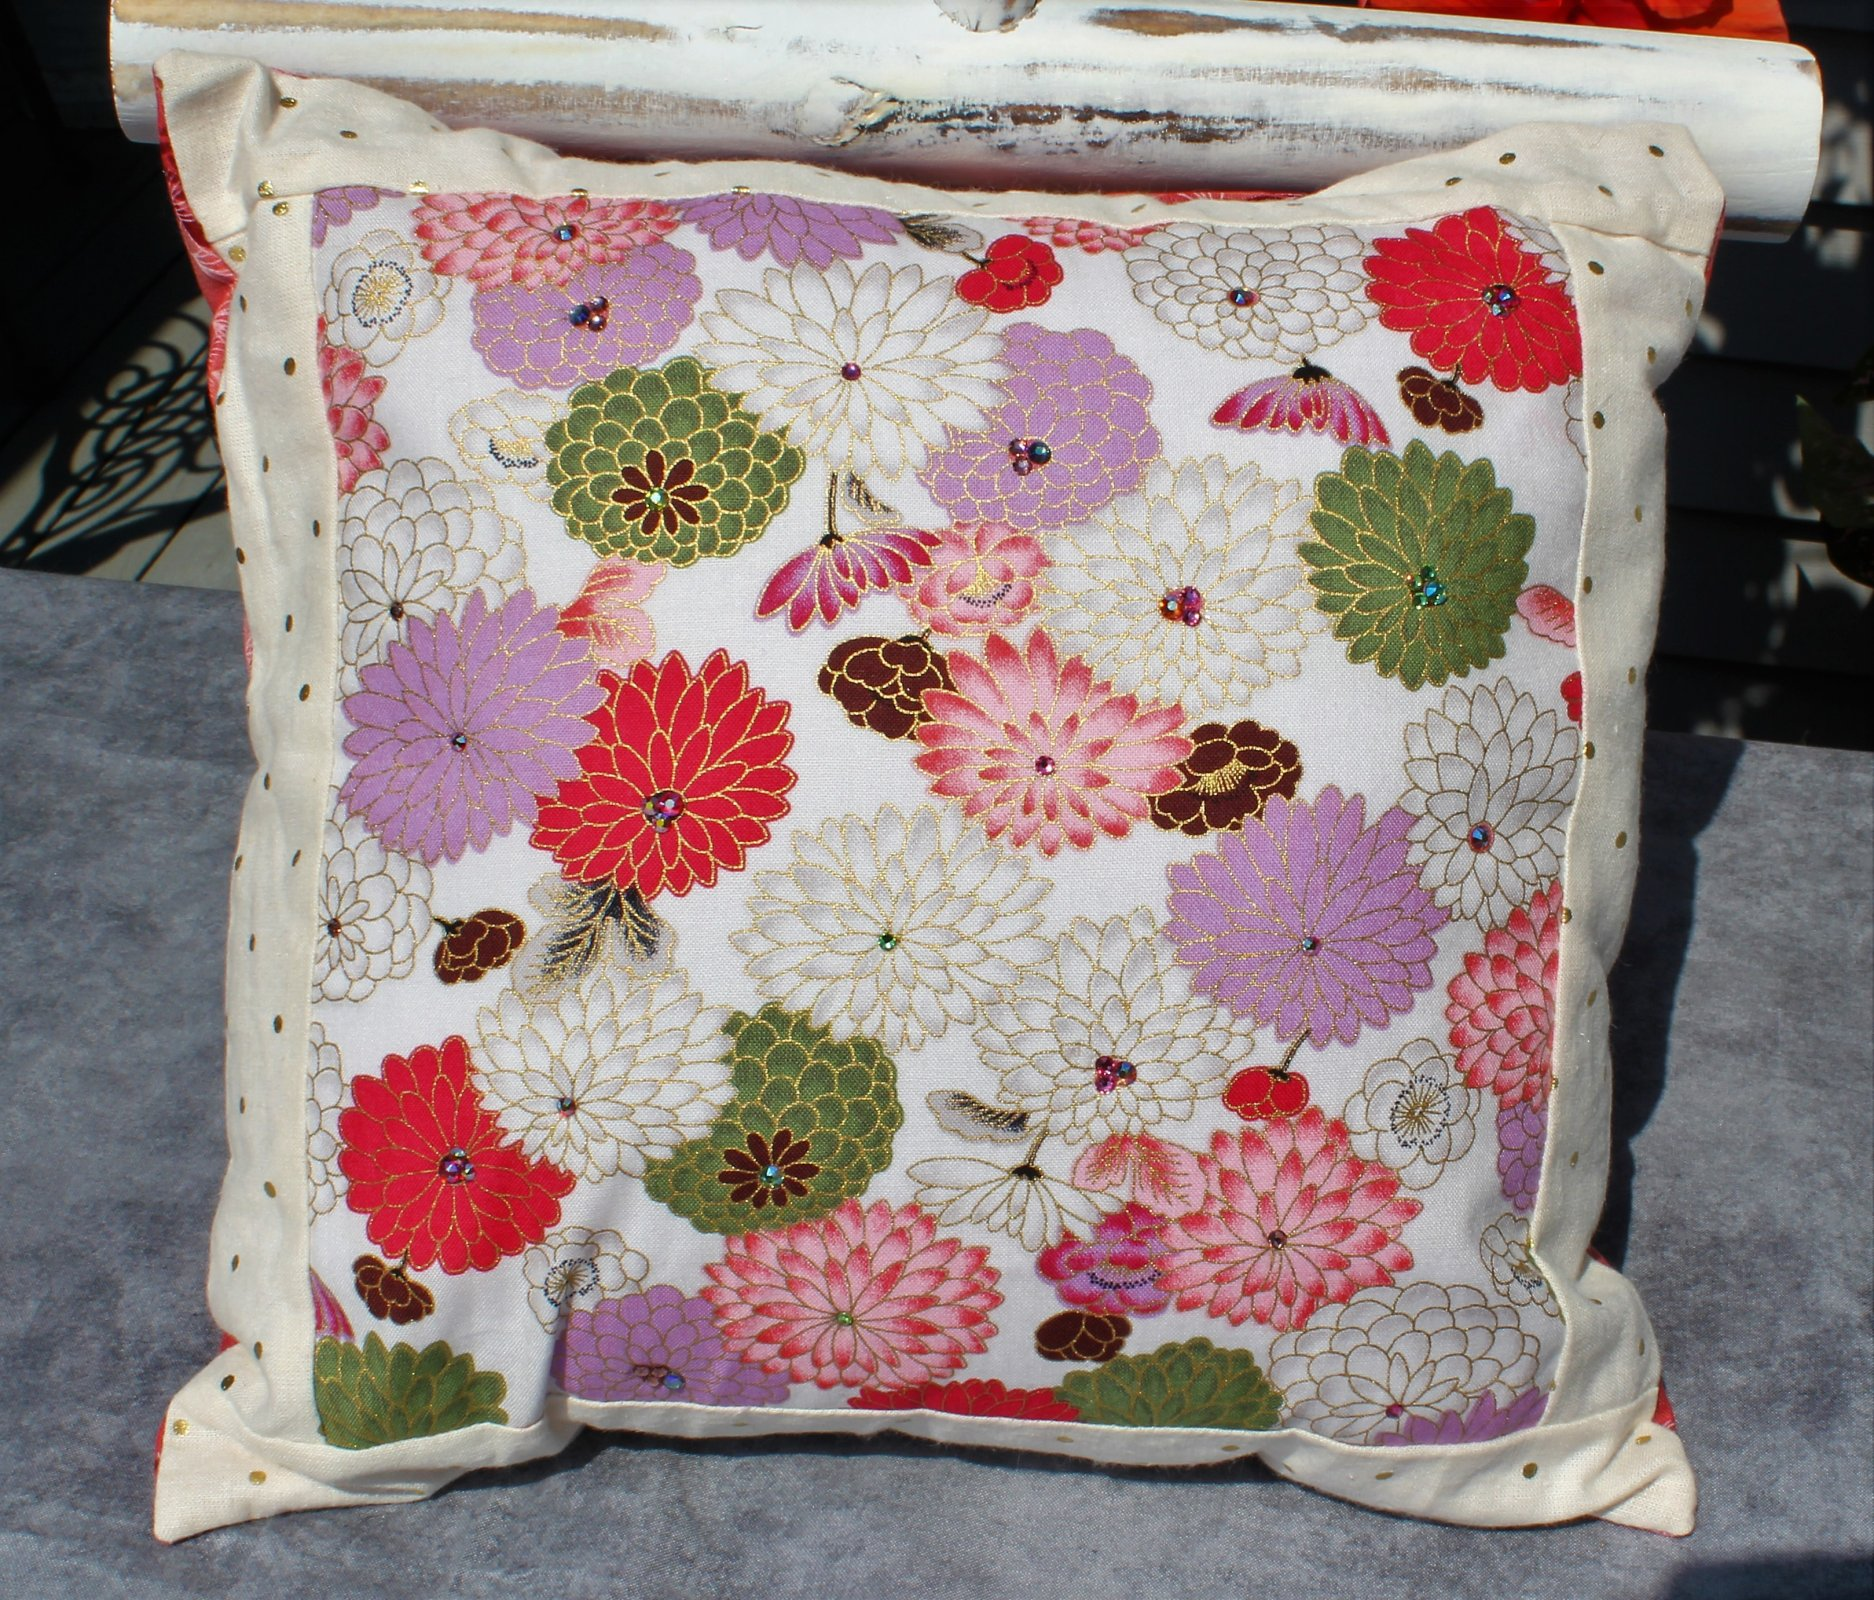 Purple/Pink/Green Floral Swarovski Embellished Decorative Pillow